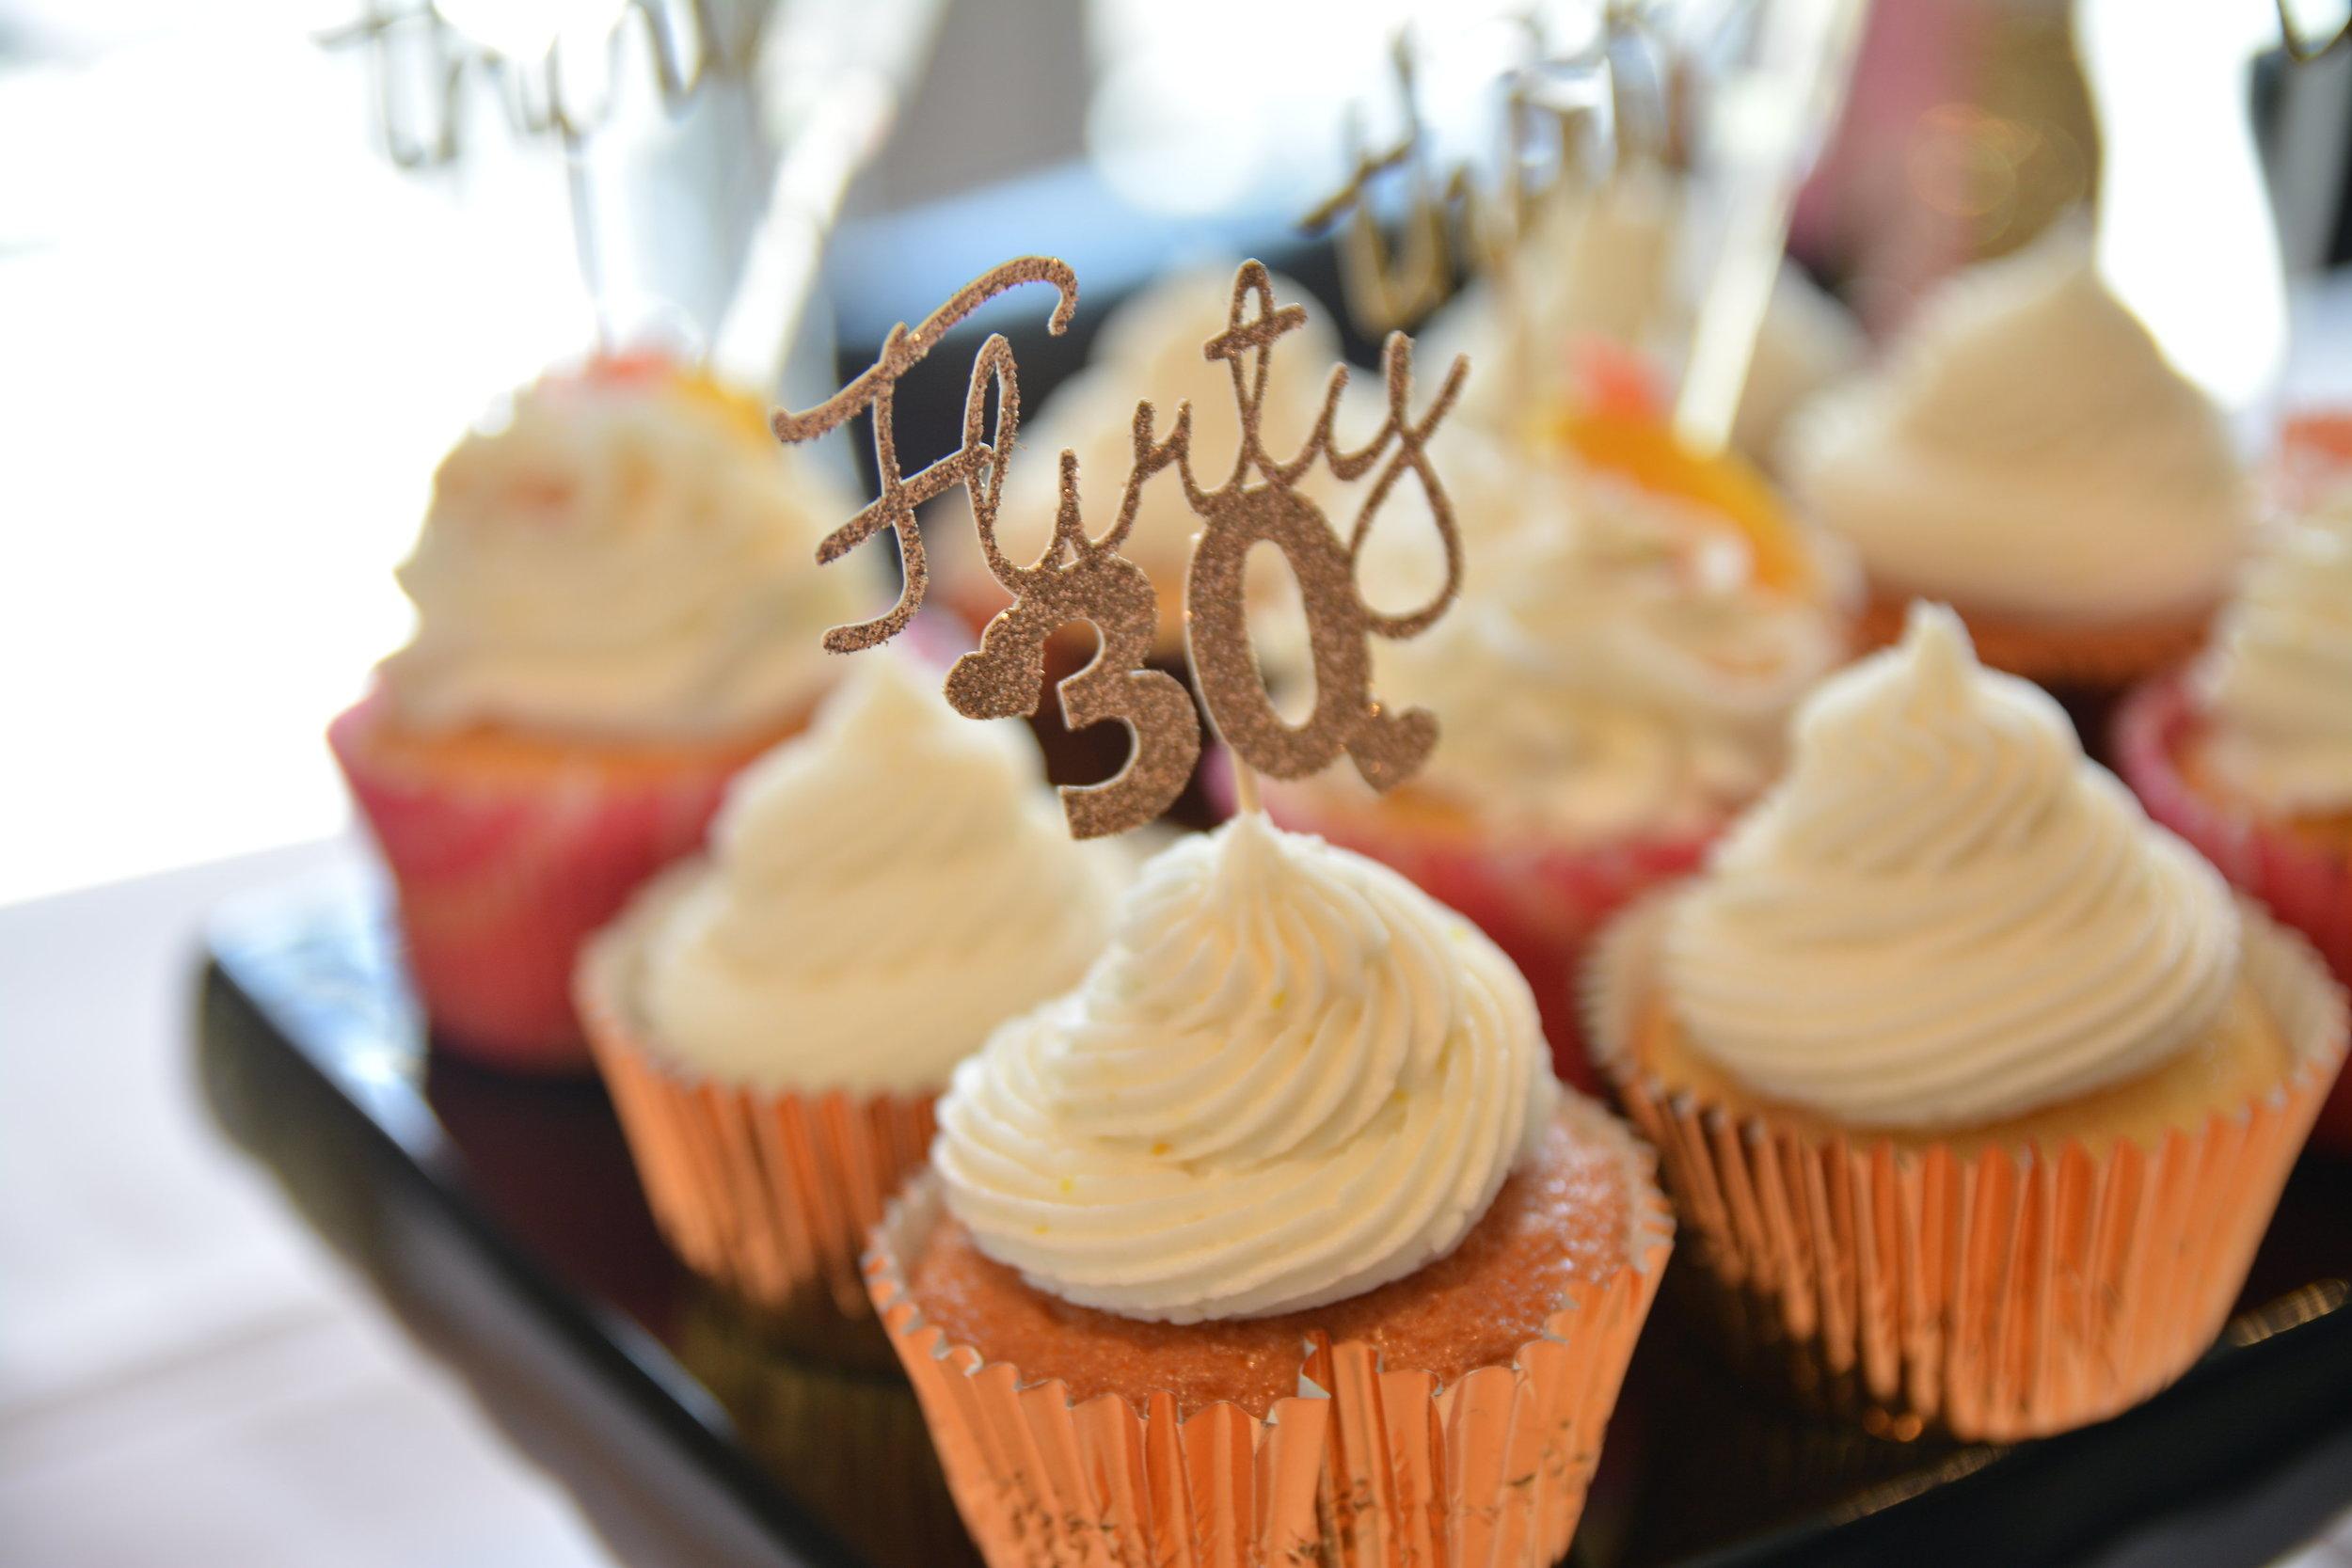 30-worthy-birthday-brunch-woolworth-dallas-party-planner-swank-soiree-paula-ewers-18.jpg